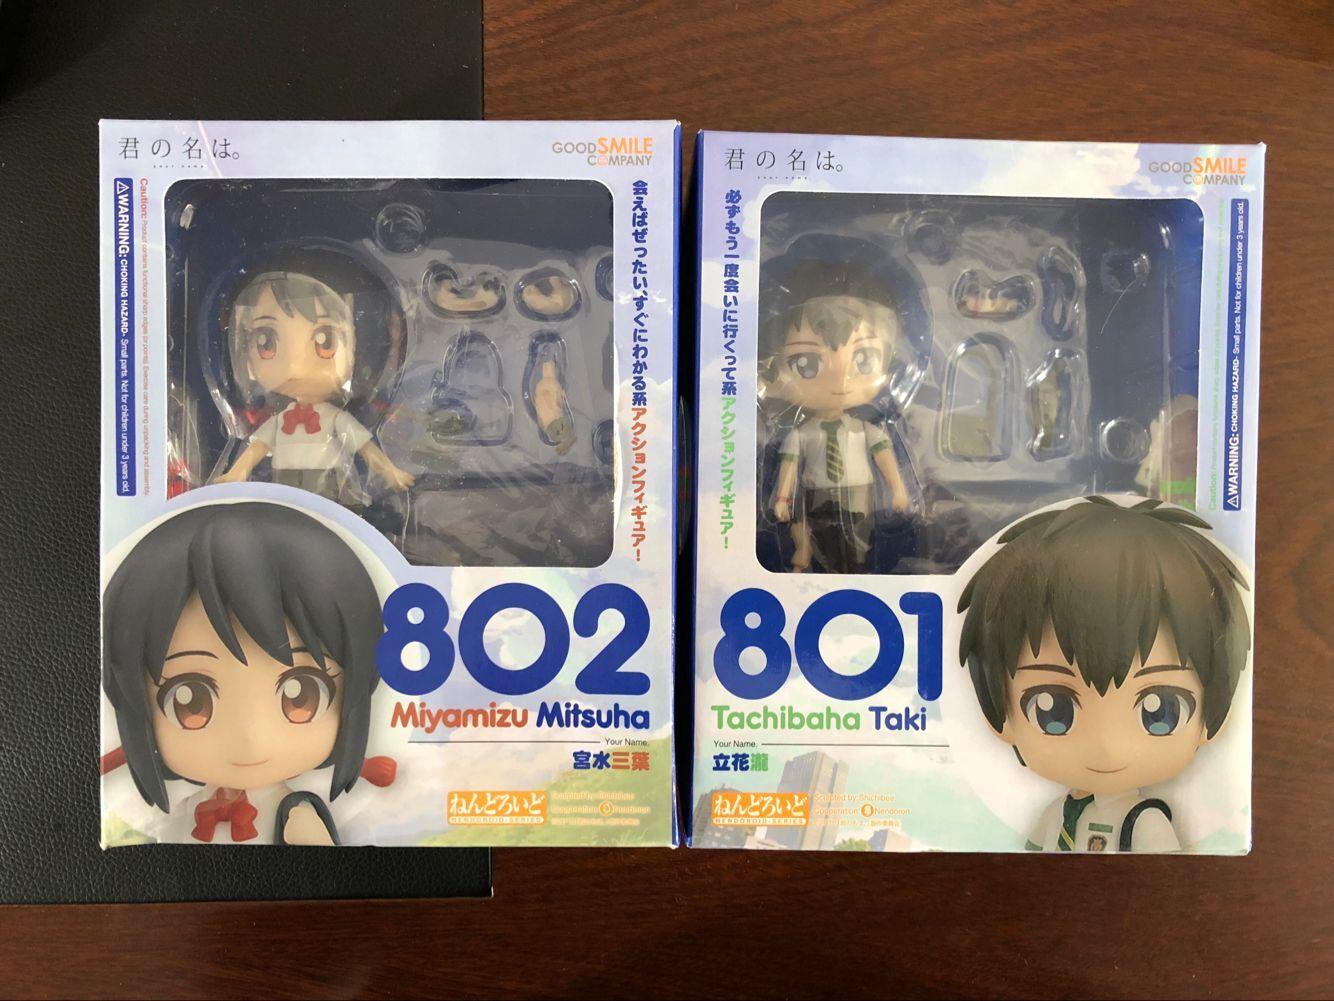 Good Smile Company Nendoroid 802 Tu Nombre mitsuha miyamizu figura de Japón